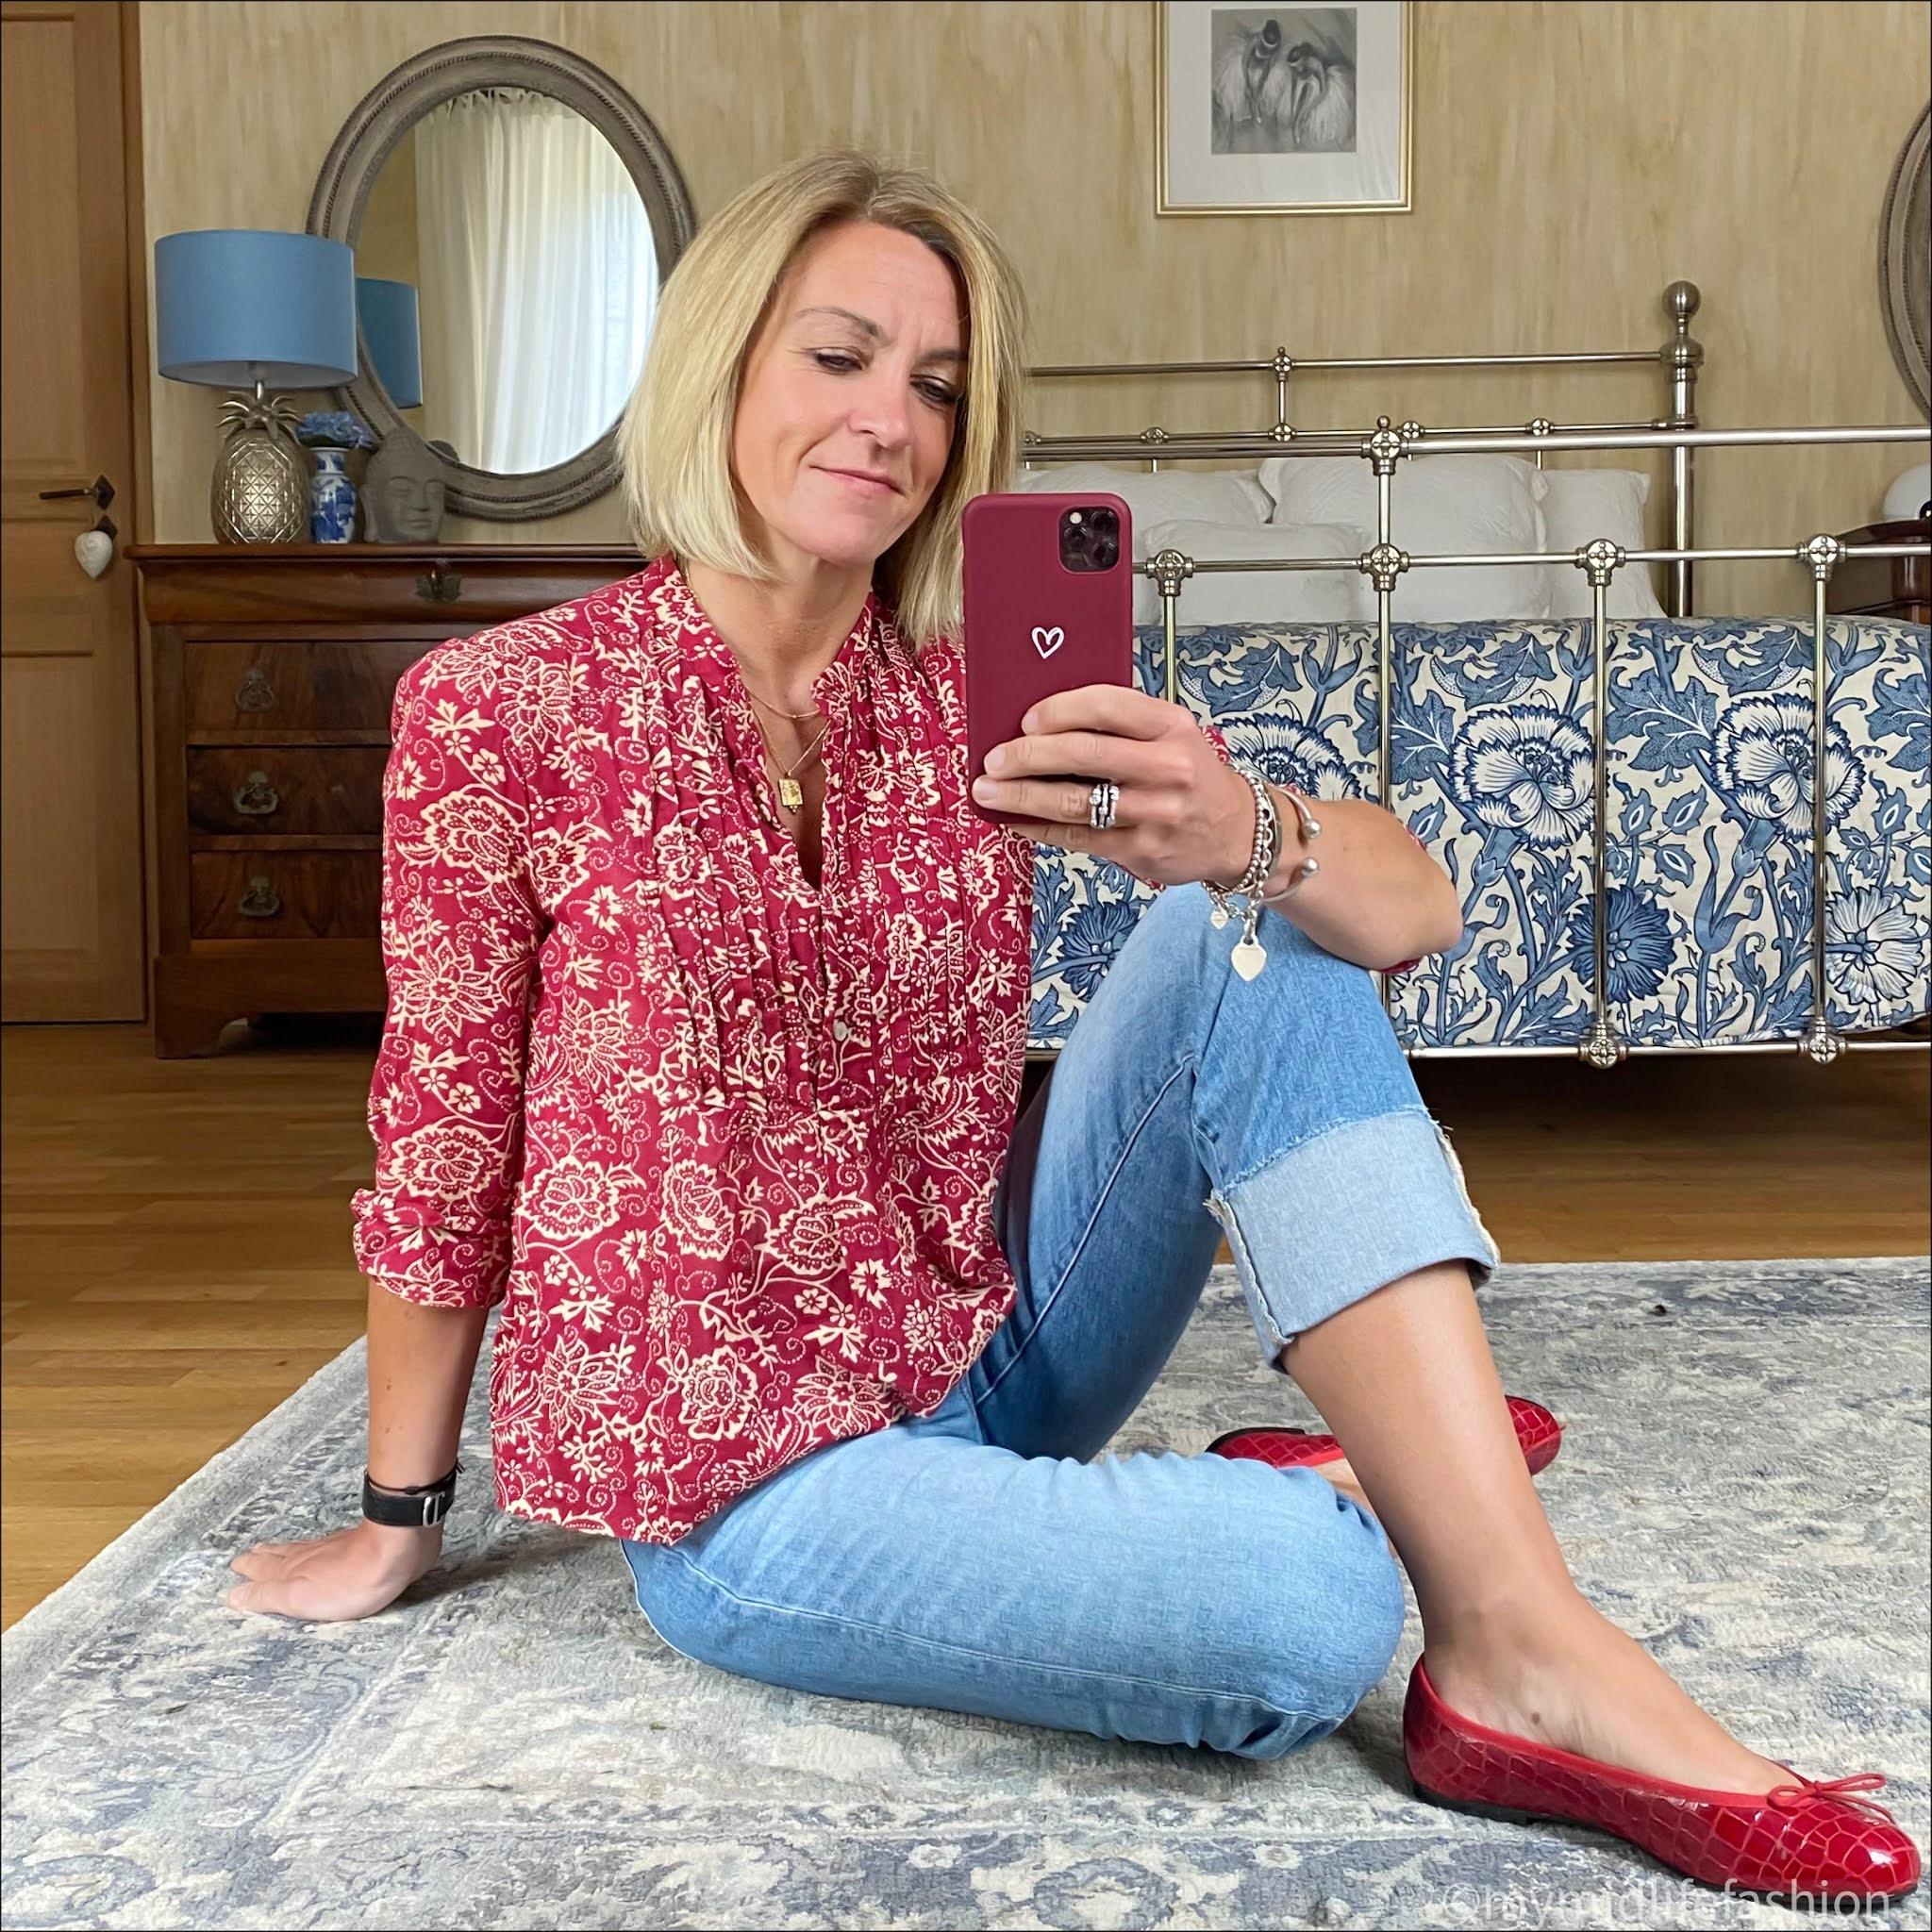 my midlife fashion, Isabel Marant Etoile cotton floral blouse, j crew turn up boyfriend jeans, French sole Henrietta patent ballet pumps